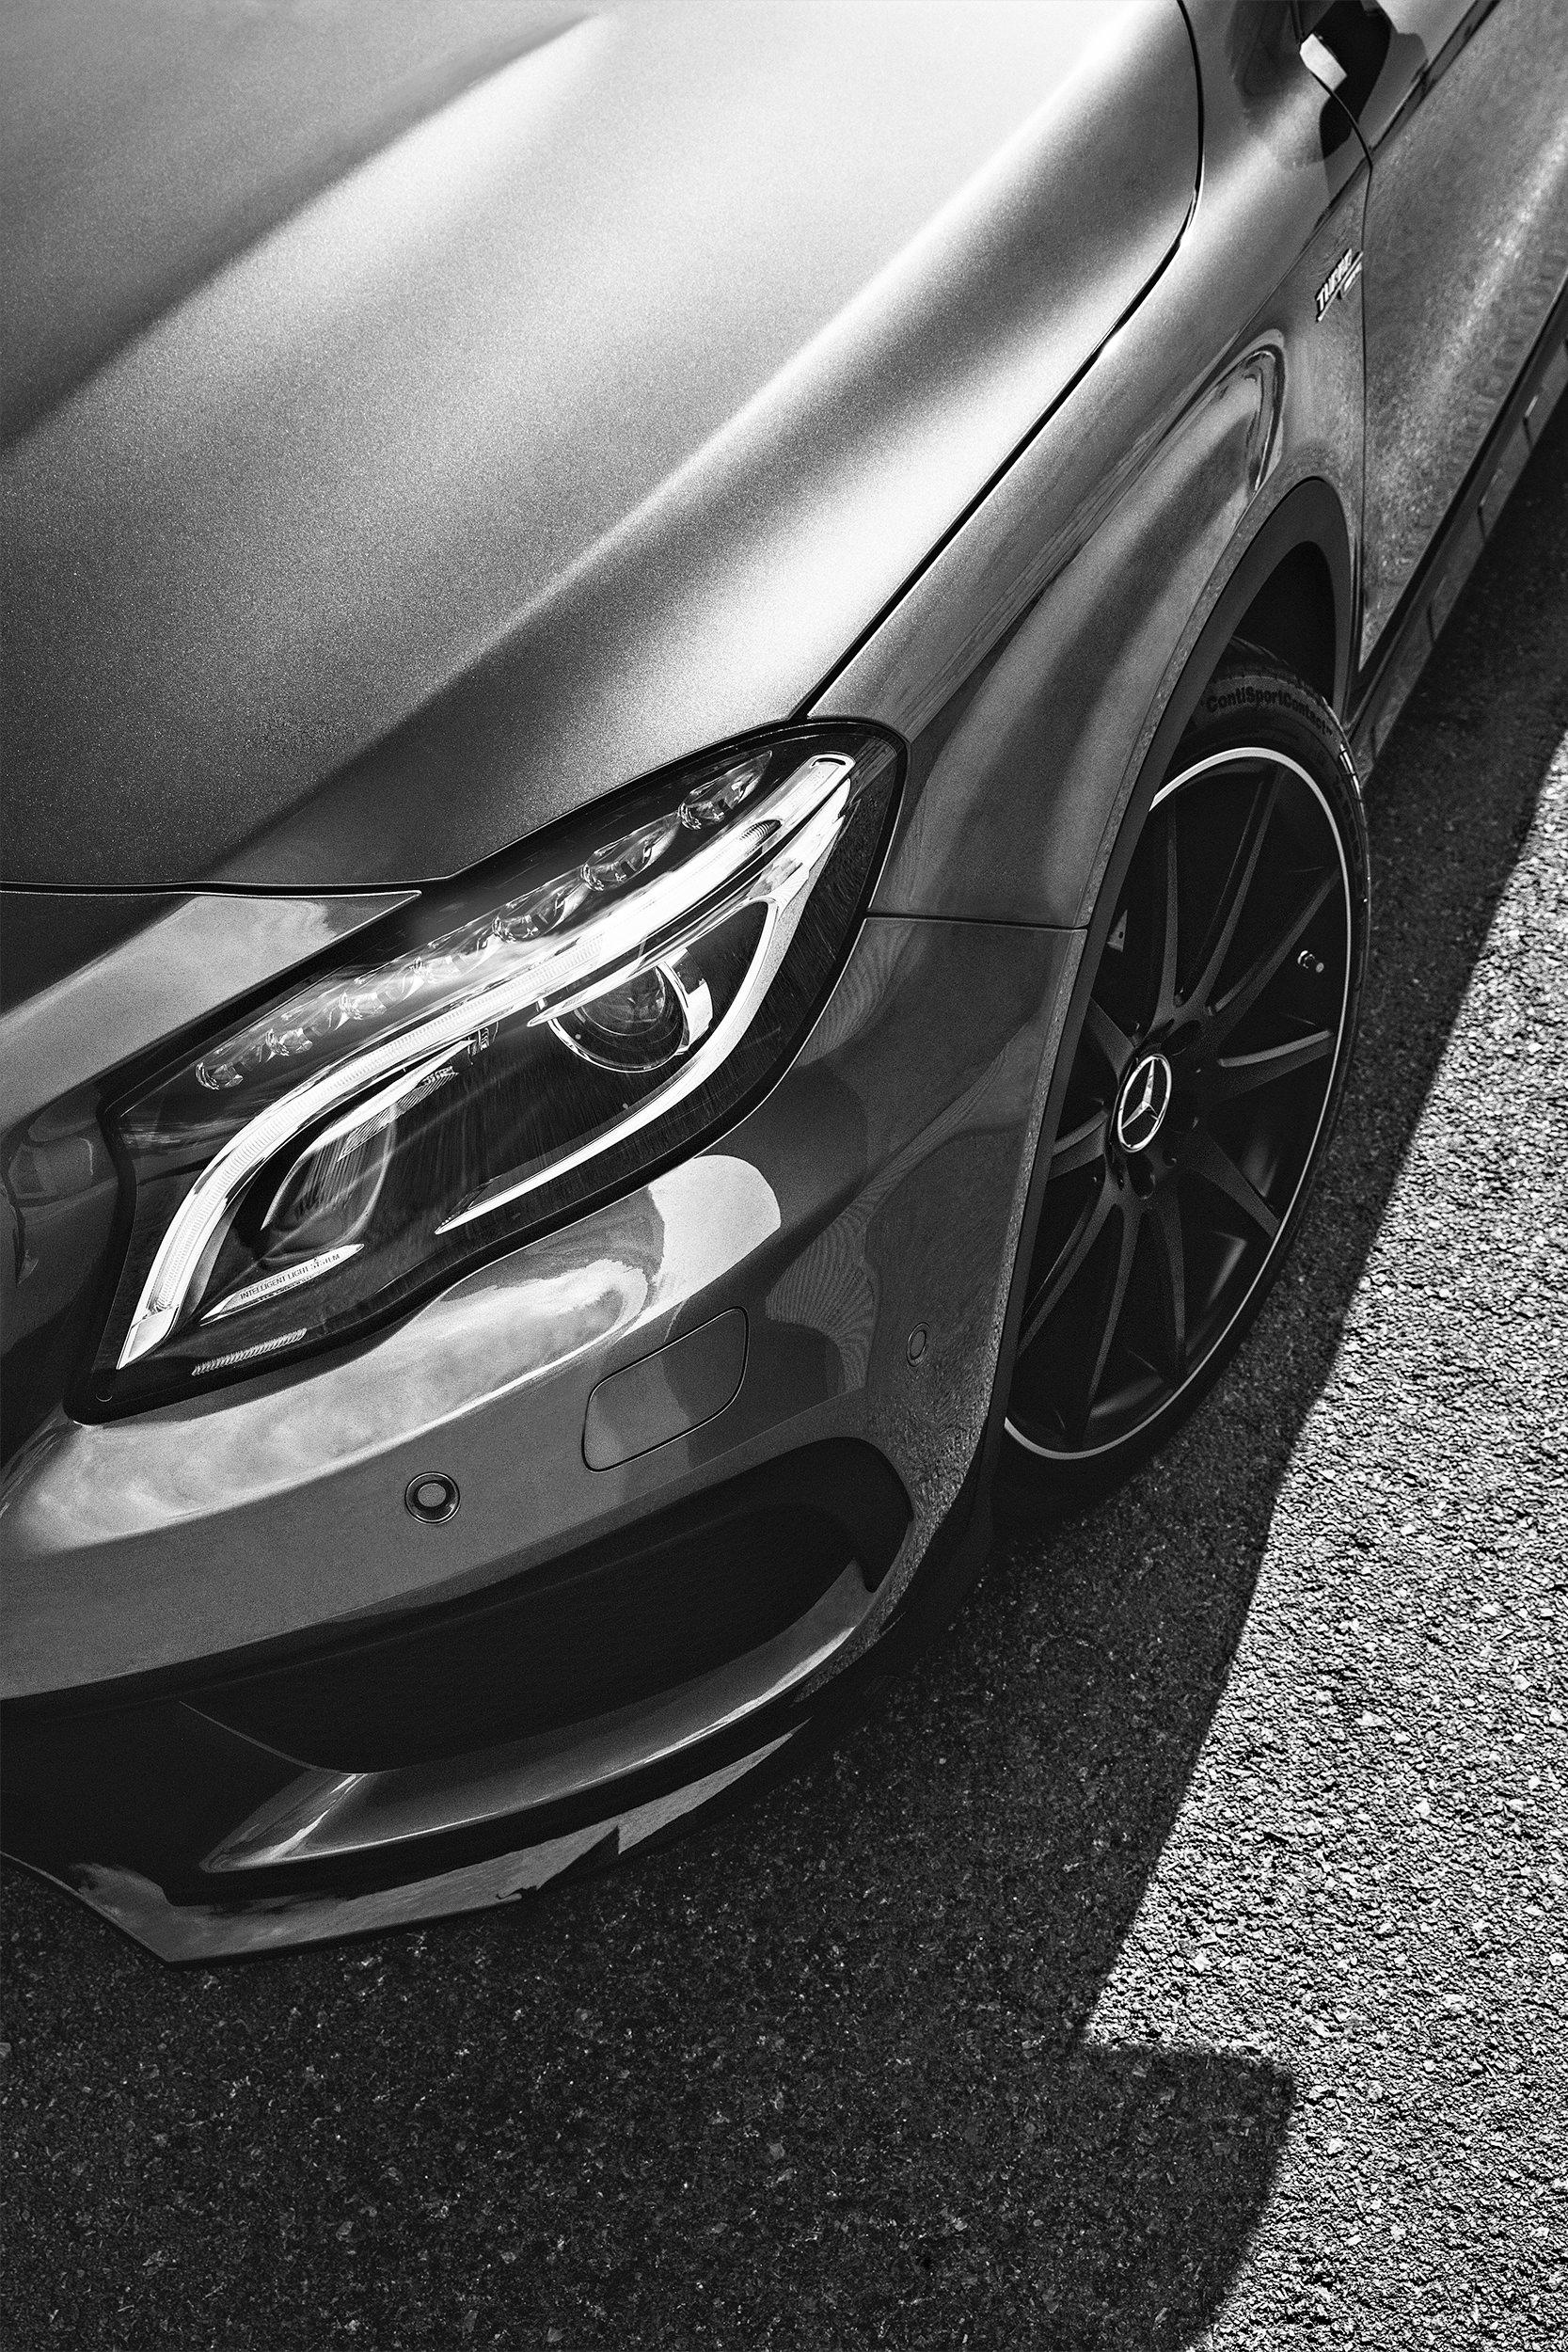 Mercedes-Benz_GLA_Sven-Cichowicz-9660.jpg